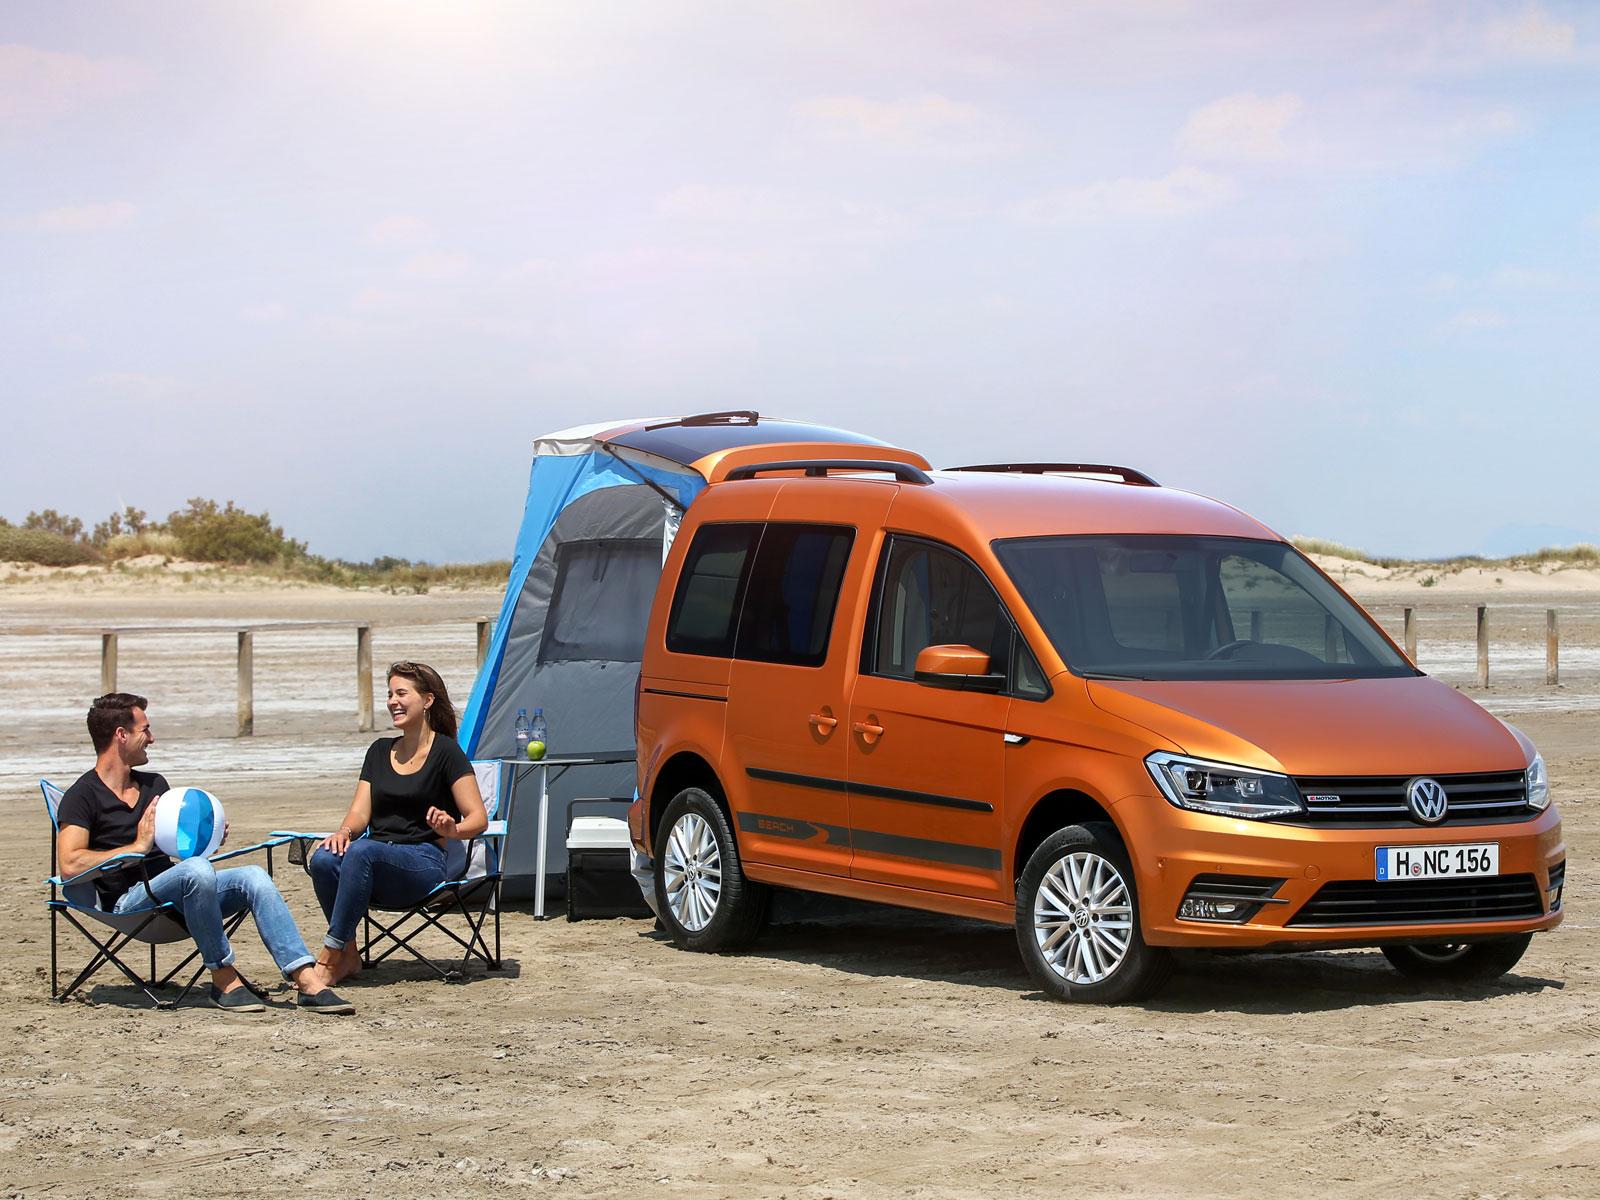 vw caddy beach reisemobil f r einen tag am meer auto. Black Bedroom Furniture Sets. Home Design Ideas